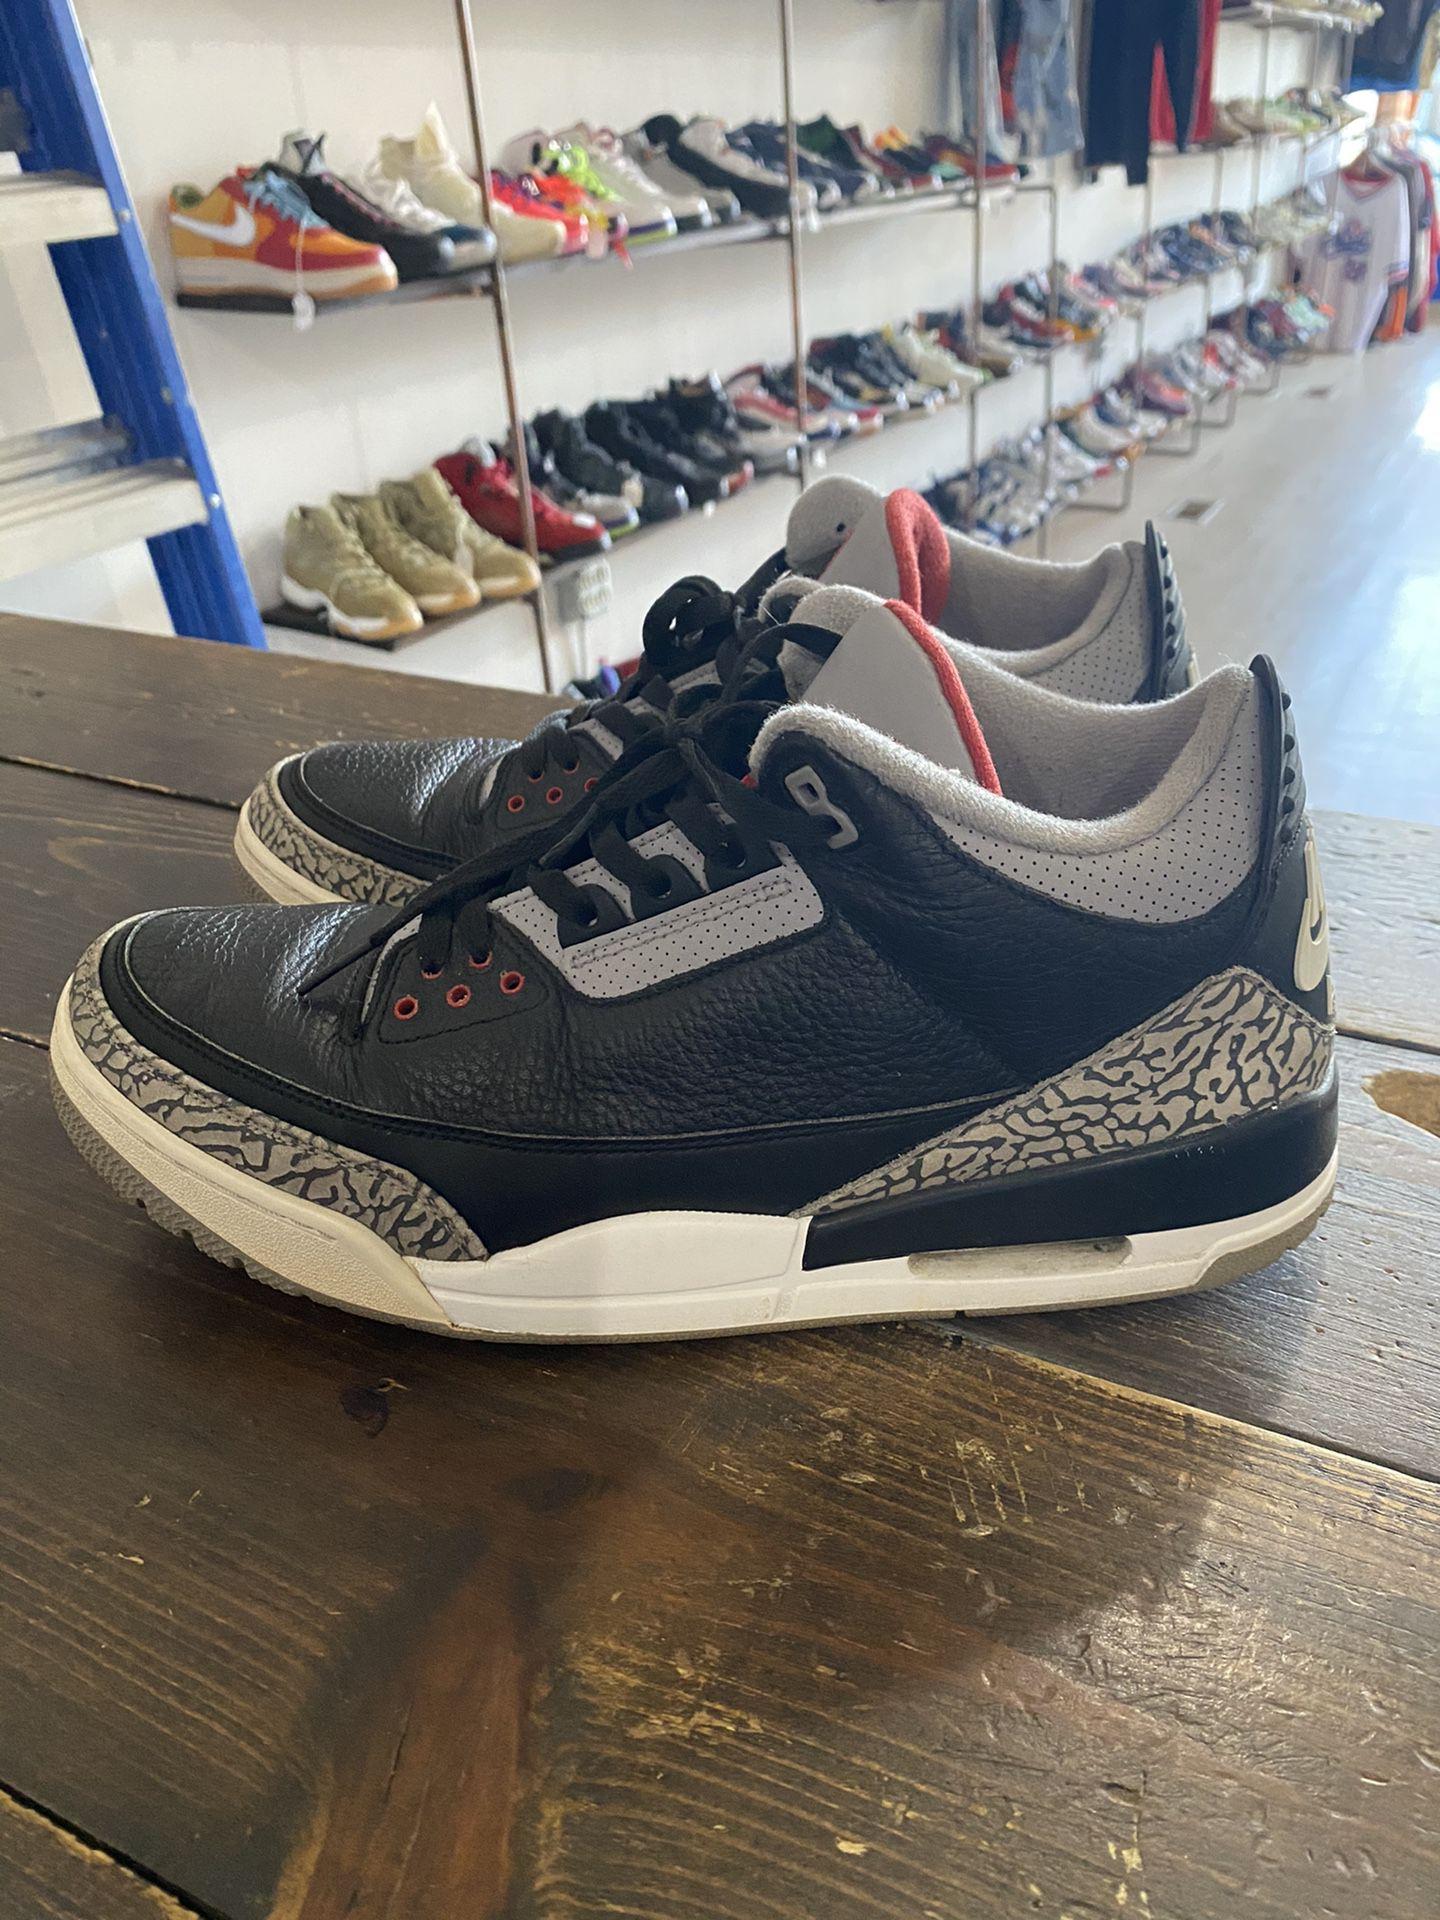 Air Jordan black cement 3 size 13